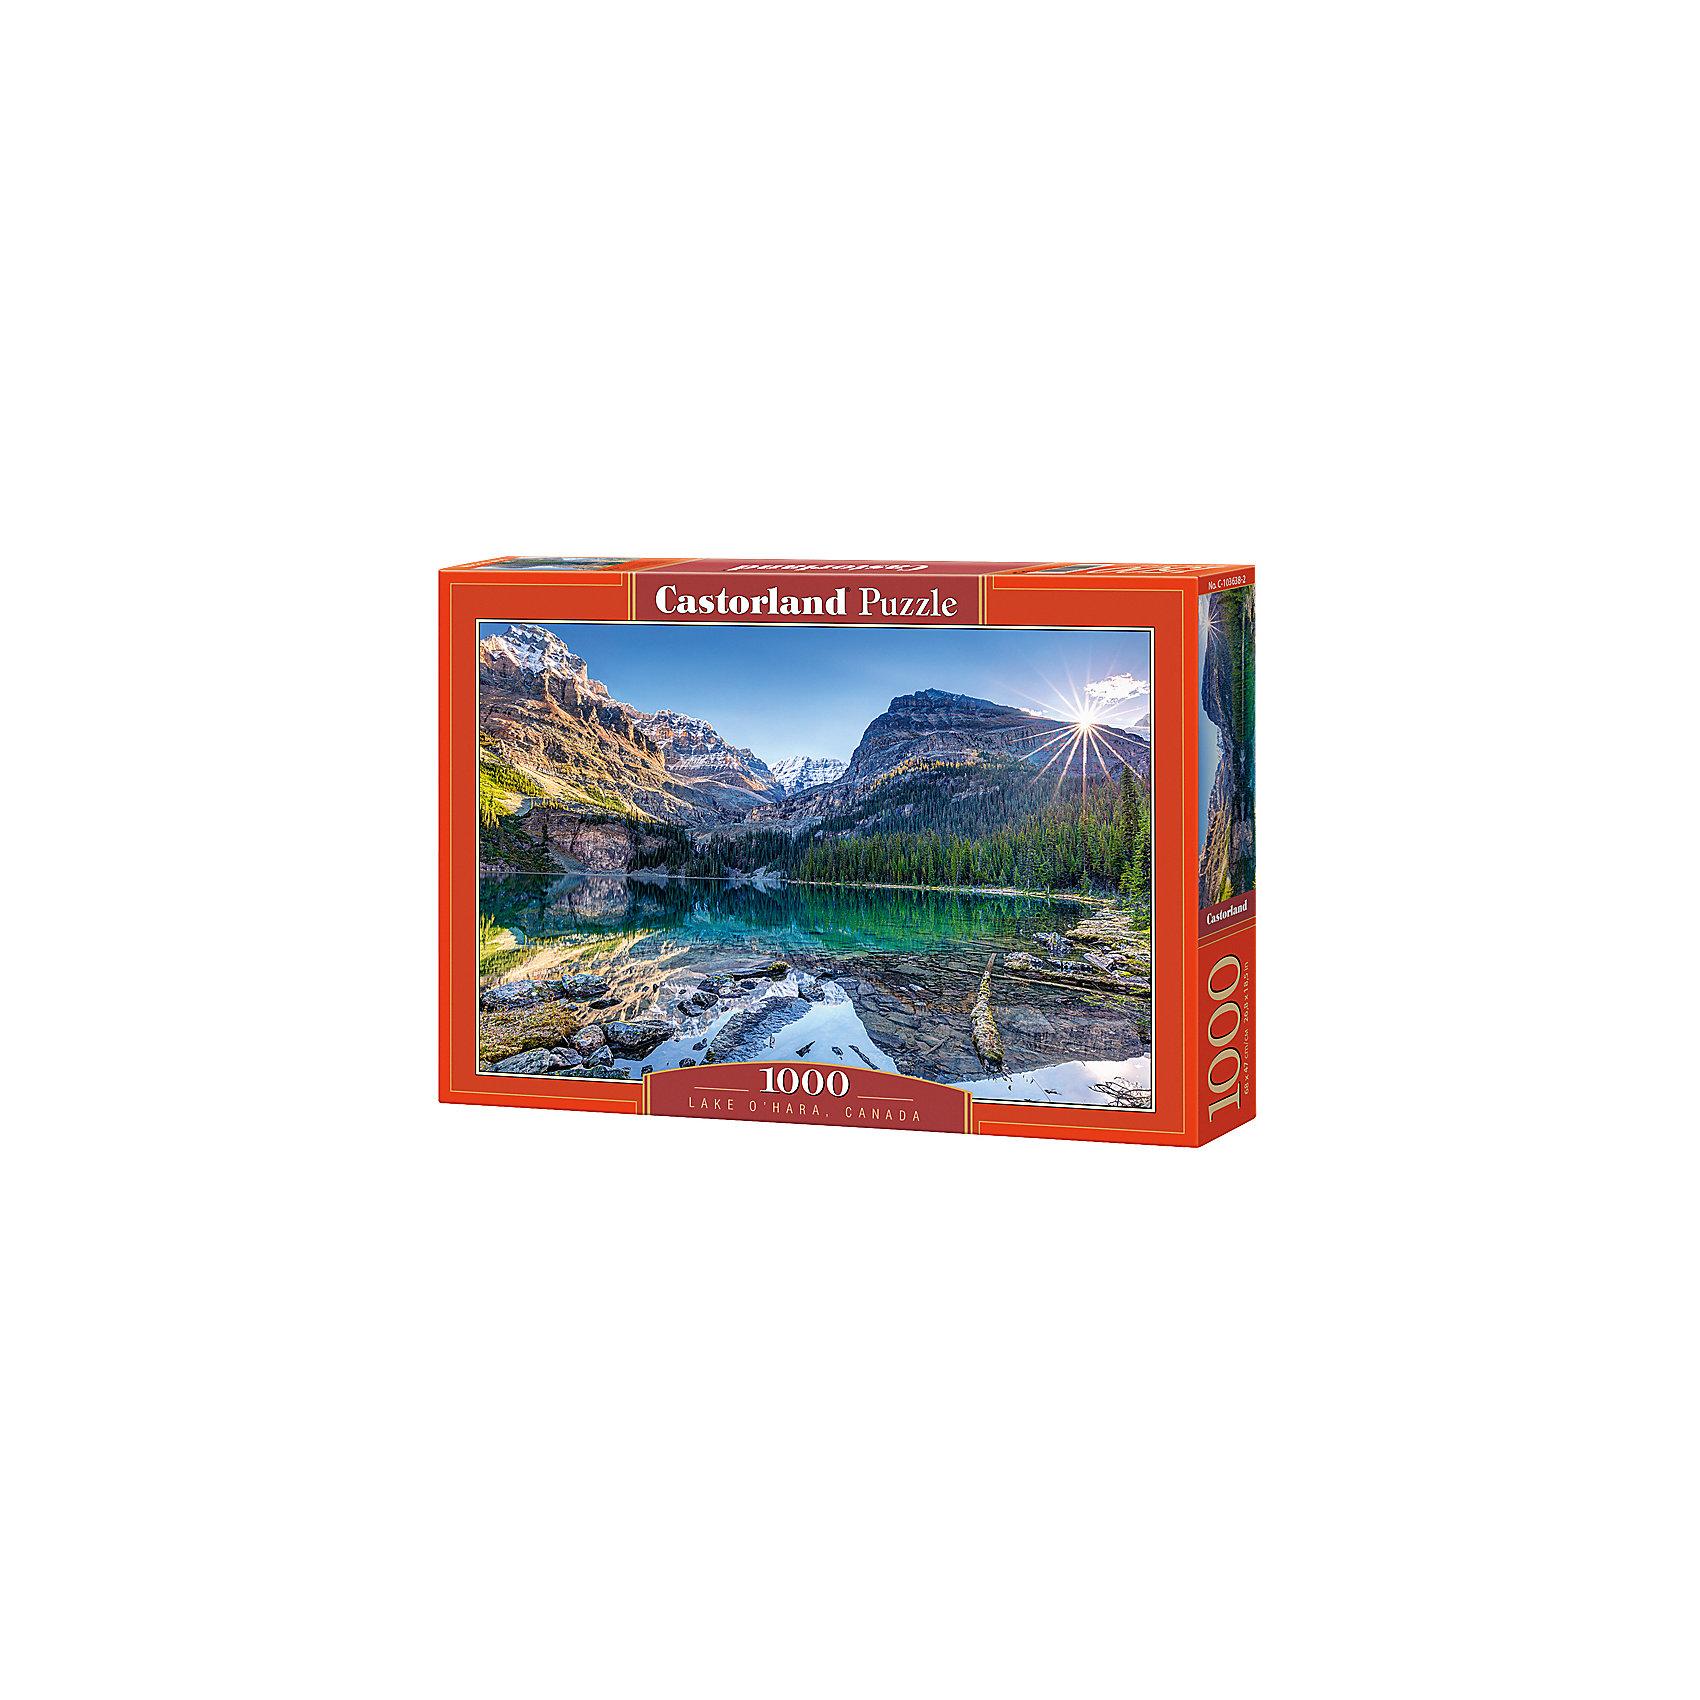 Пазл Озеро Охара, Канада, 1000 деталей, CastorlandКлассические пазлы<br><br><br>Ширина мм: 350<br>Глубина мм: 250<br>Высота мм: 50<br>Вес г: 500<br>Возраст от месяцев: 168<br>Возраст до месяцев: 2147483647<br>Пол: Унисекс<br>Возраст: Детский<br>SKU: 6725076